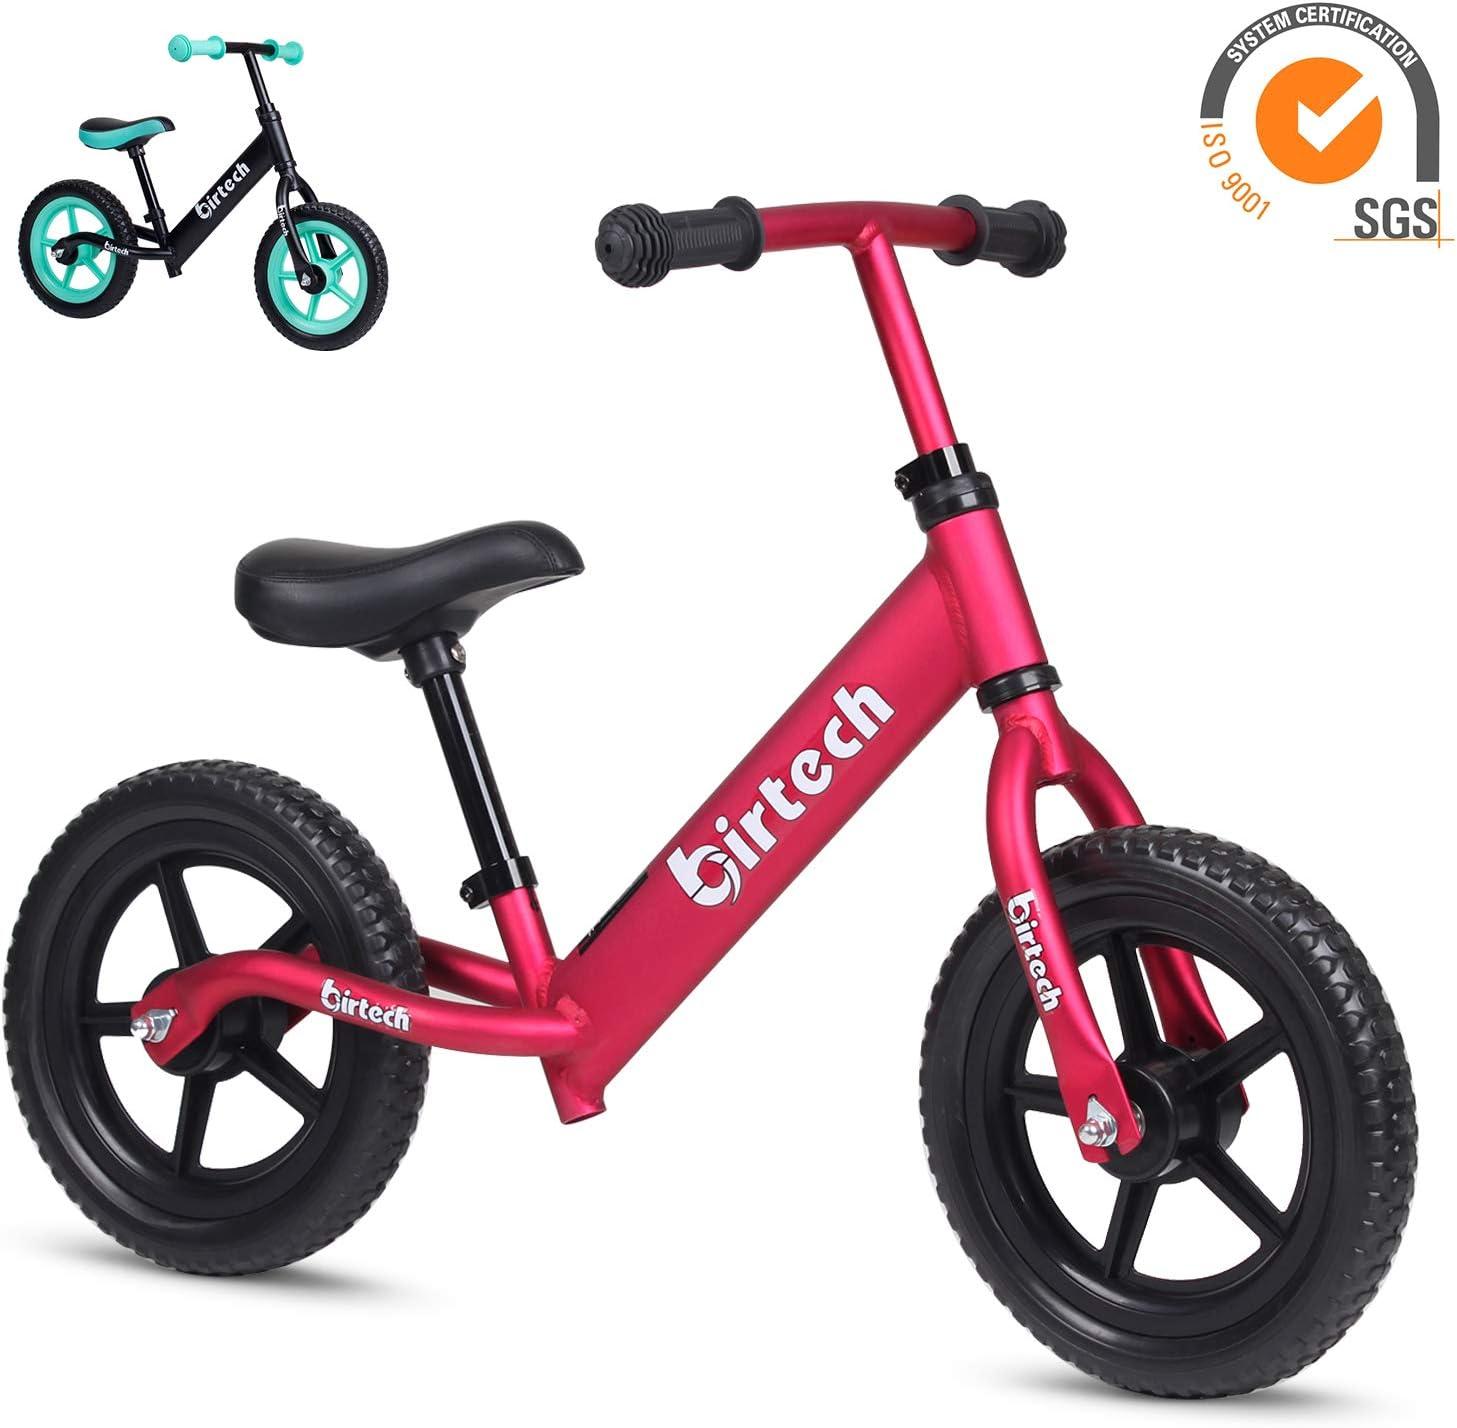 Birtech Laufrad Balance Fahrrad 12 Zoll Kinderrad Lauffahrrad Sport Fahrrad mit Stahlrahmen Verstellbarer Lenker /& Sitz f/ür Kinder,Blau